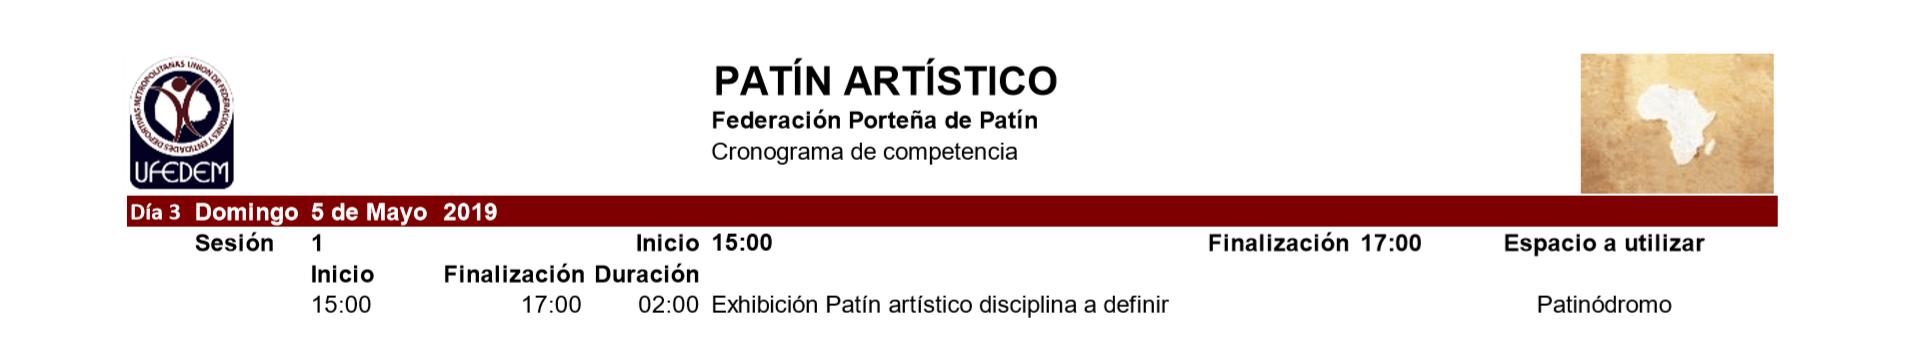 Patin Artistico 2.1 - Cronograma